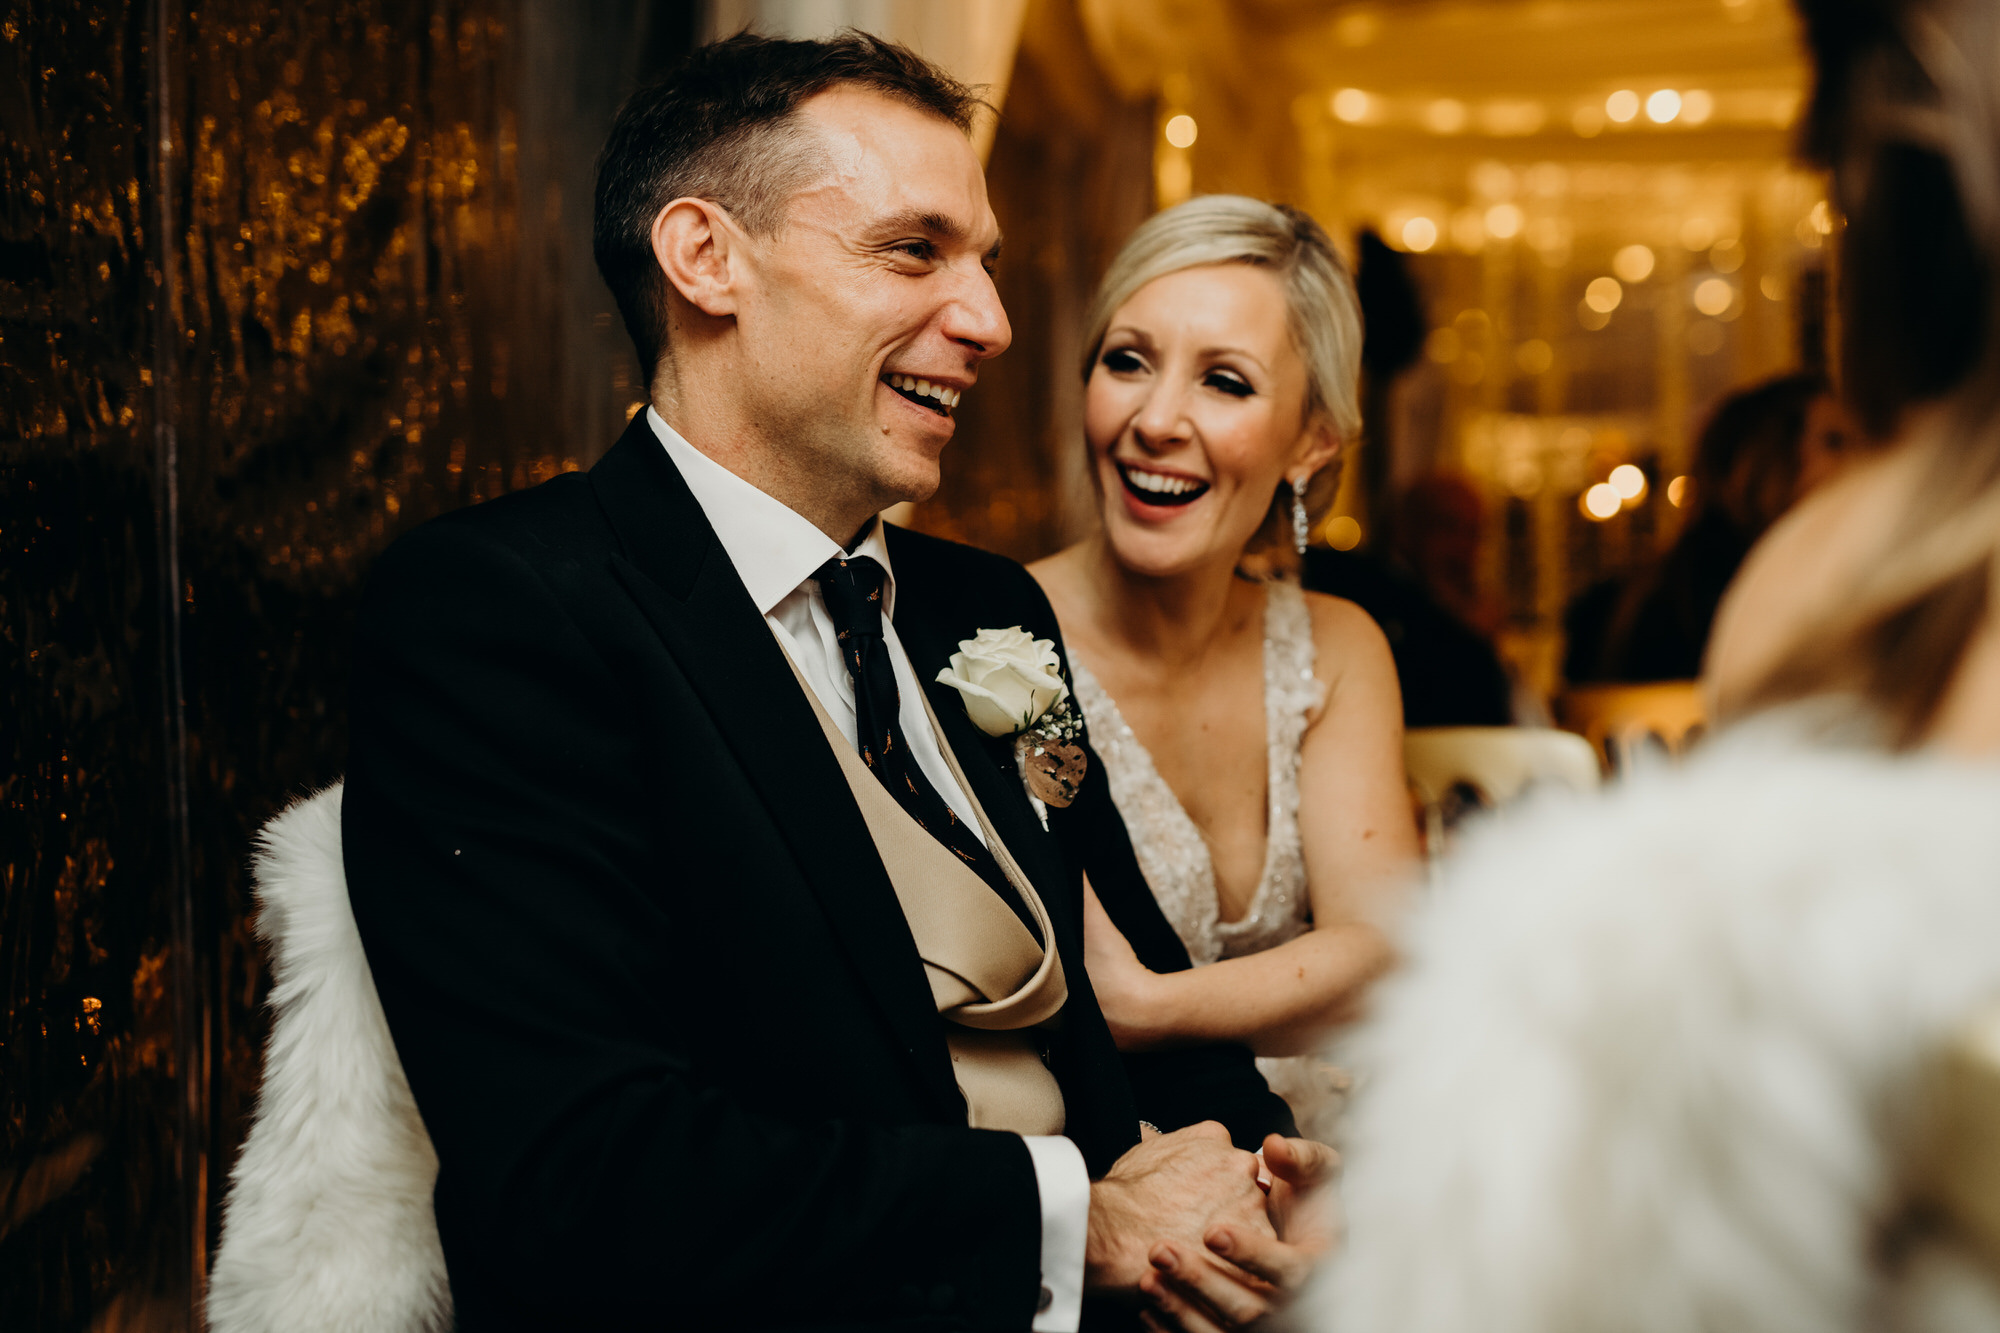 newlyweds at glasgow wedding